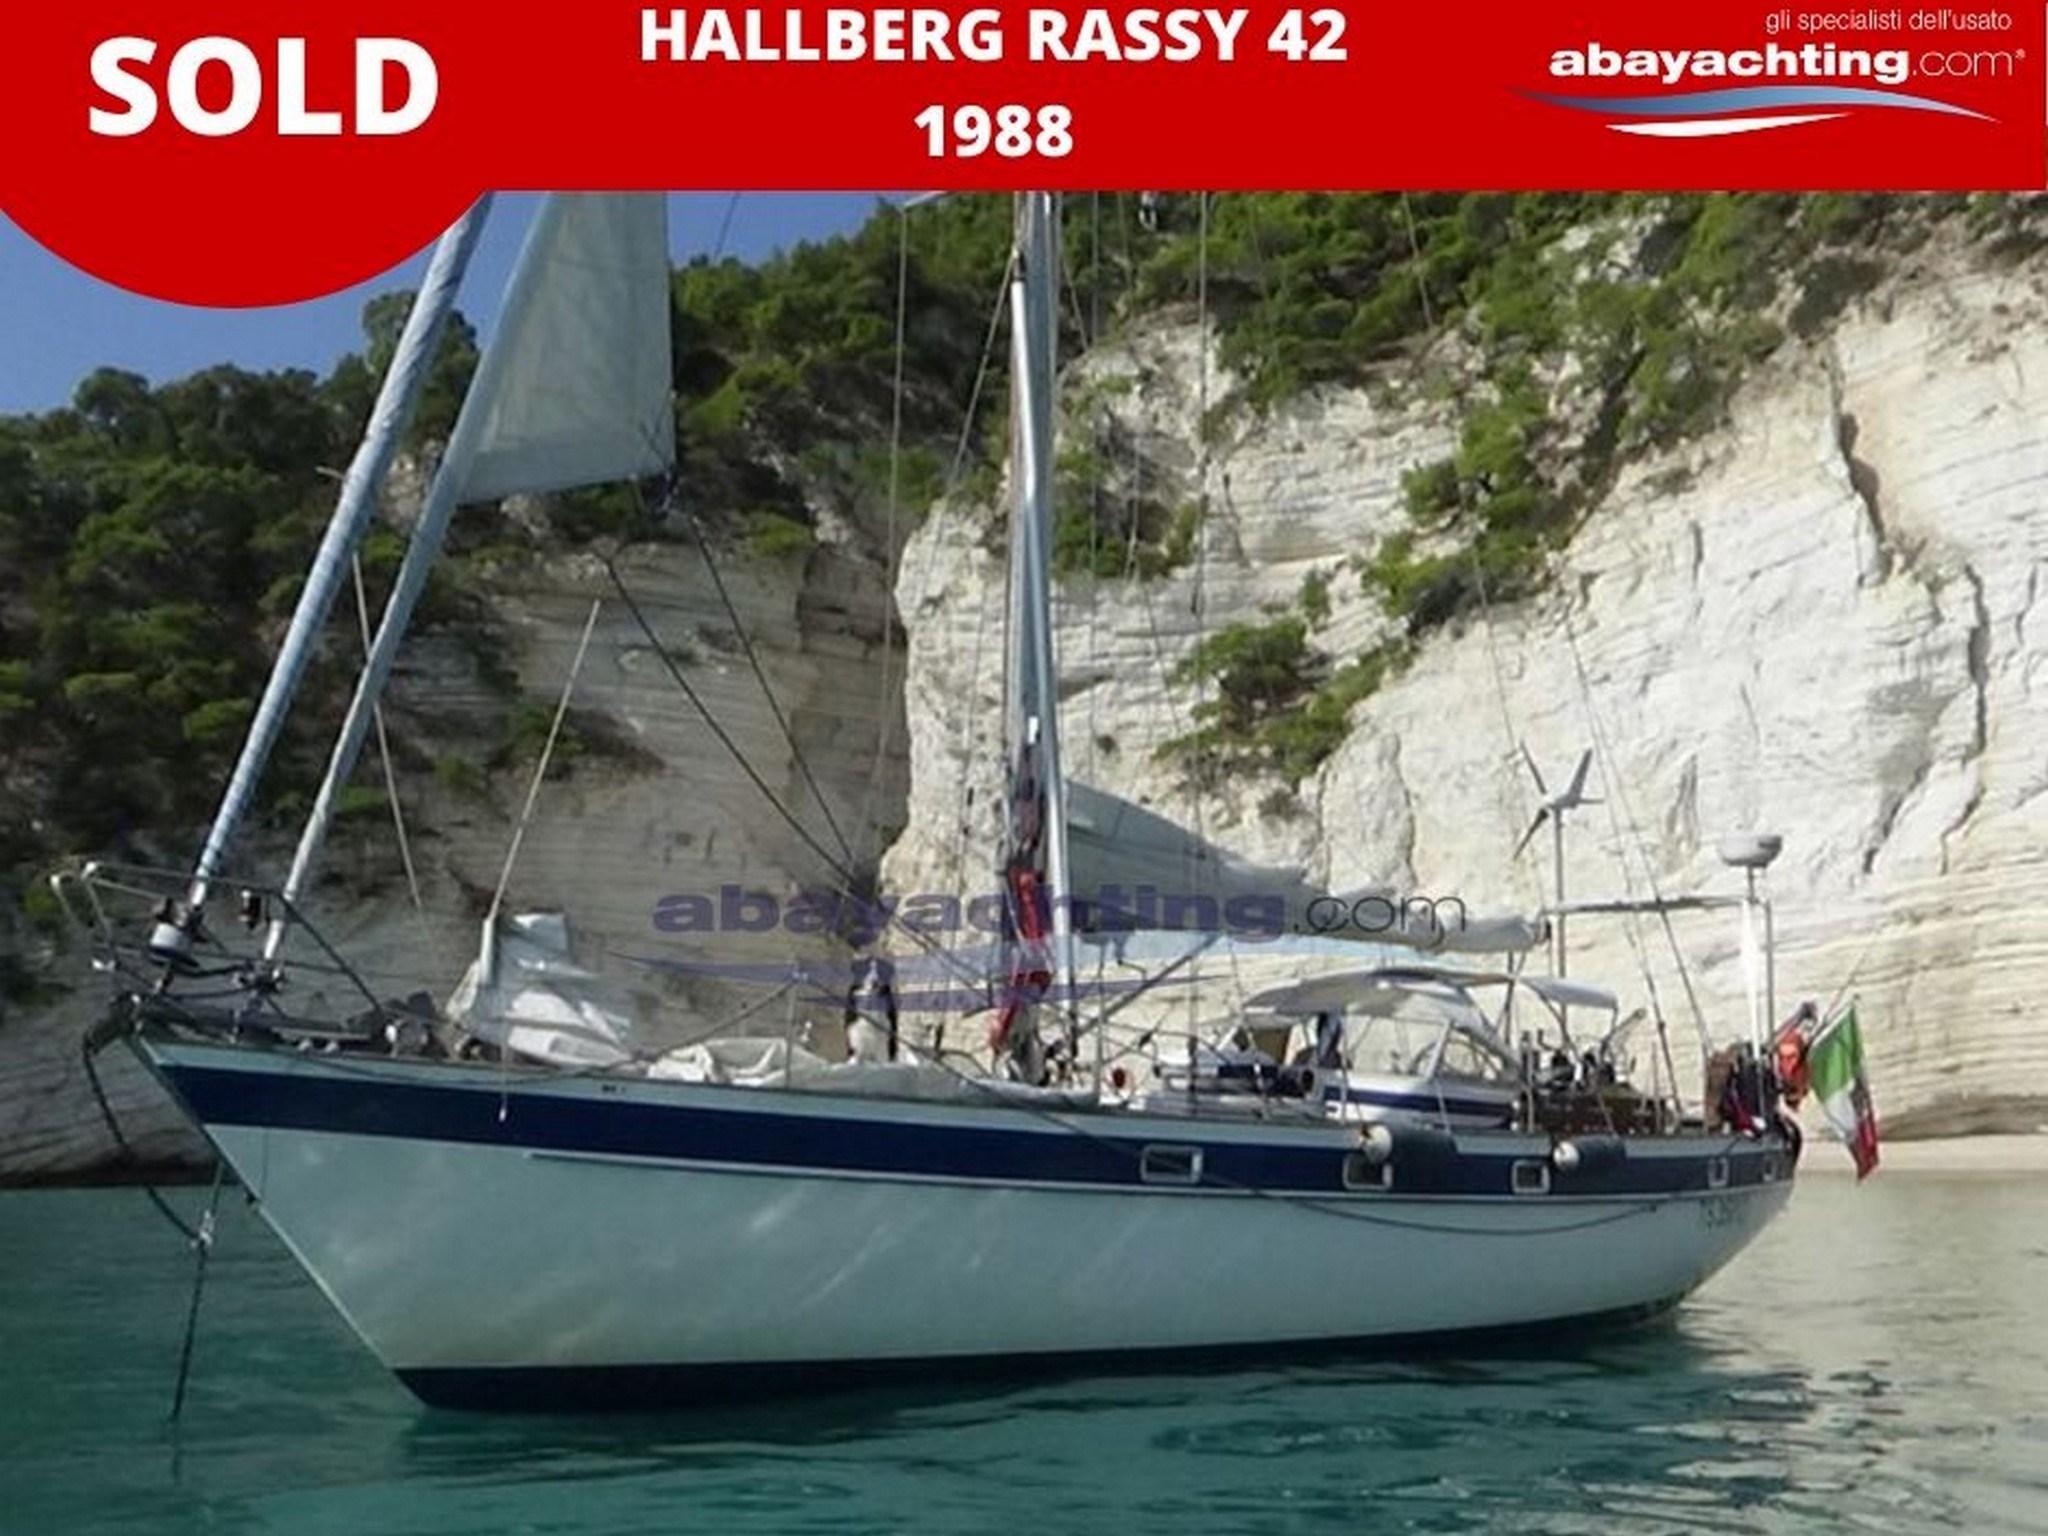 hallberg Rassy 42 sold